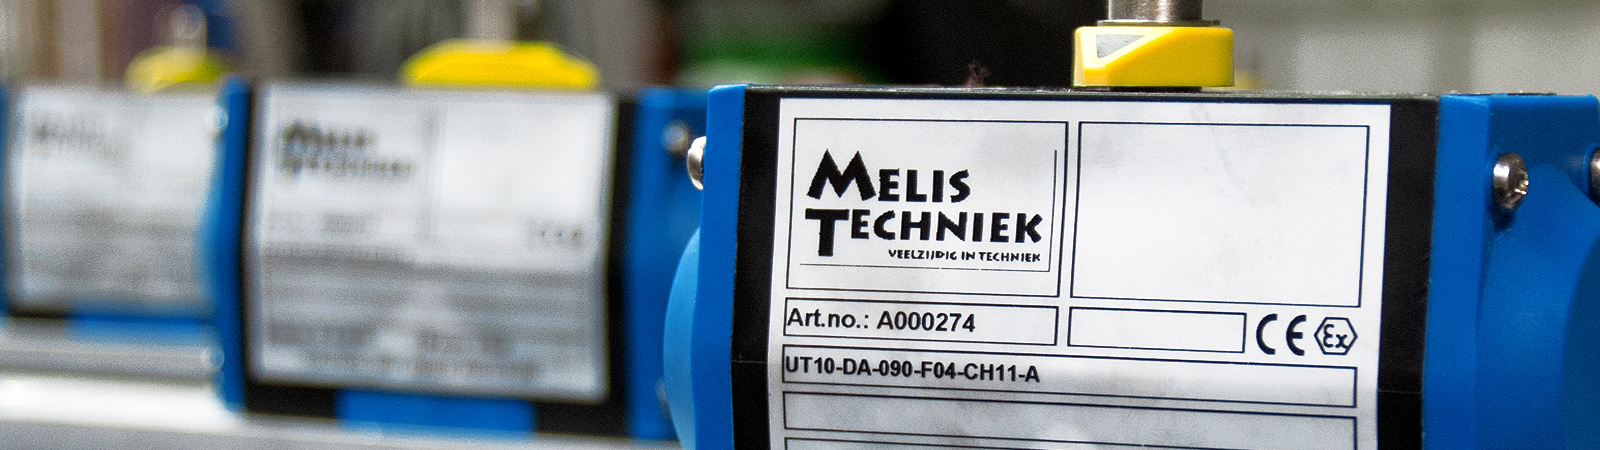 Machine onderhoud van MelisTechniek uit Boekel